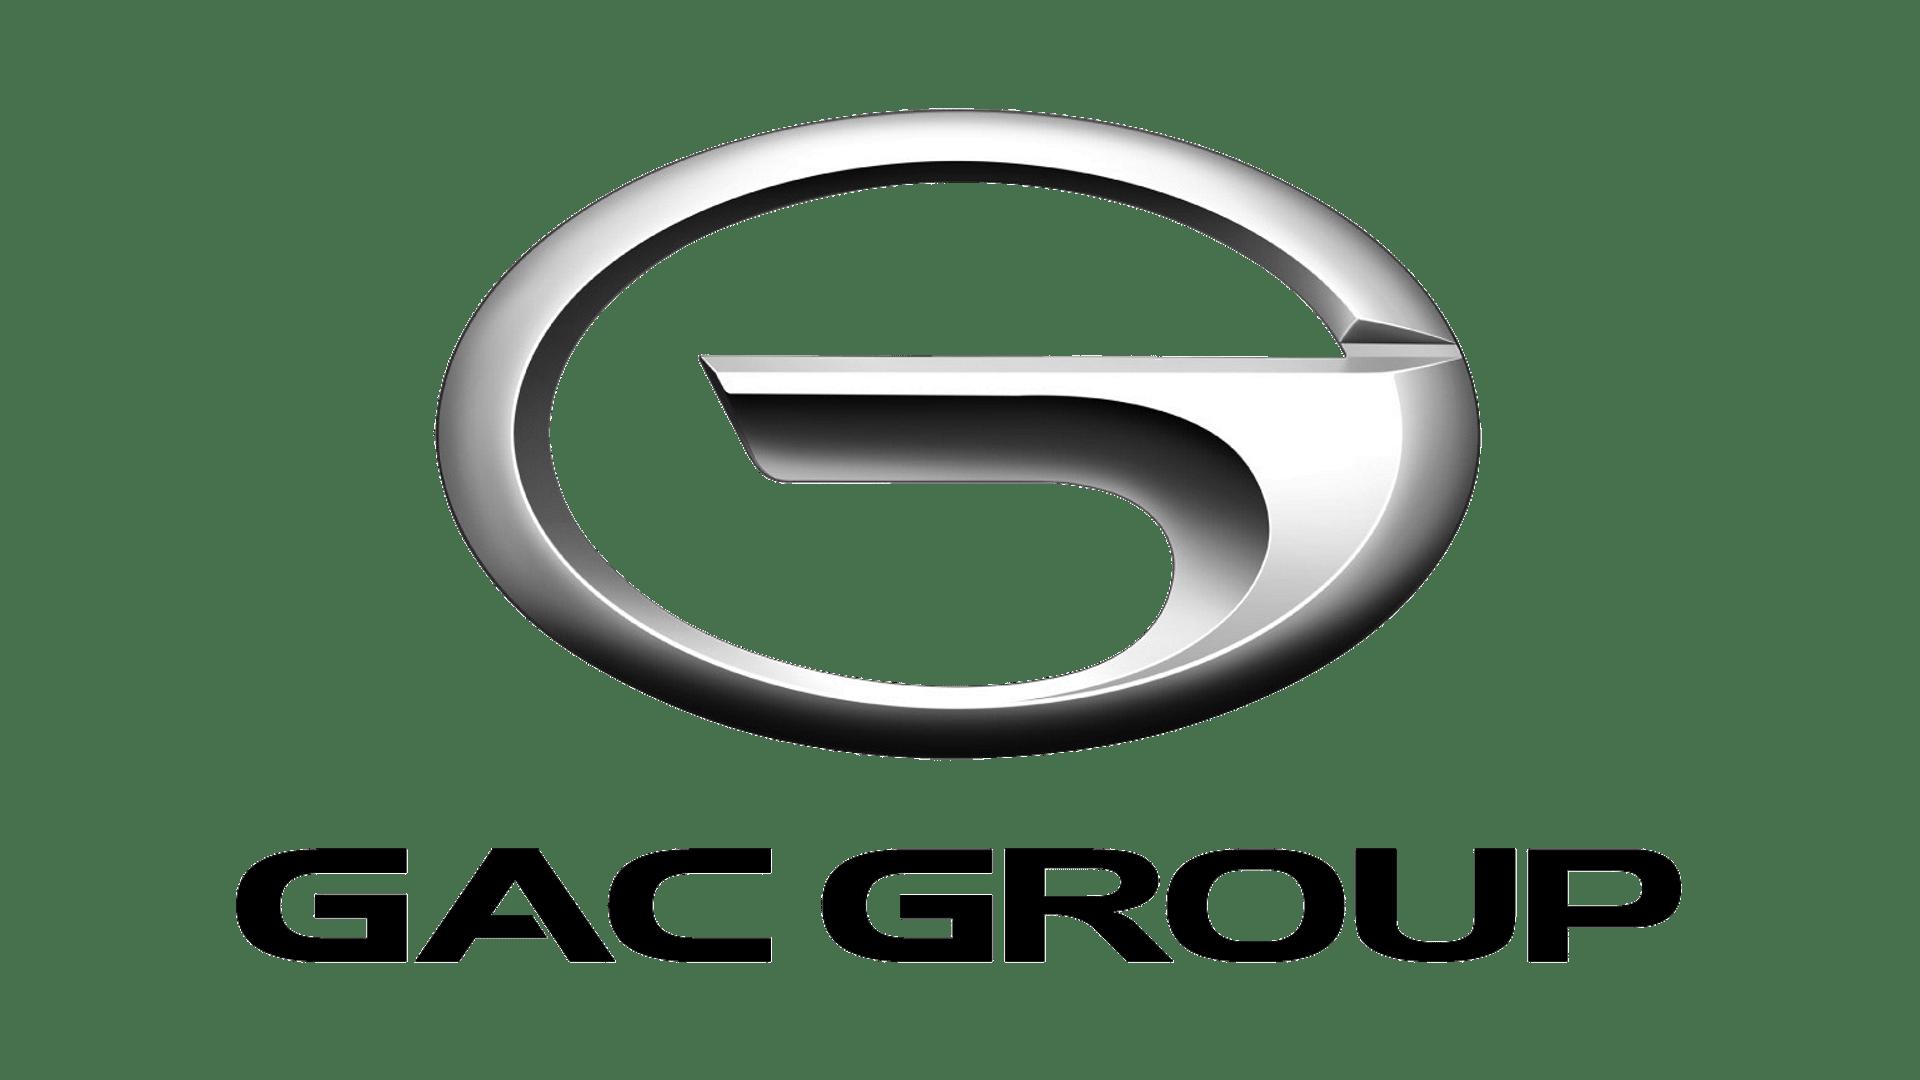 Логотип GAC (Guangzhou Automobile Company)